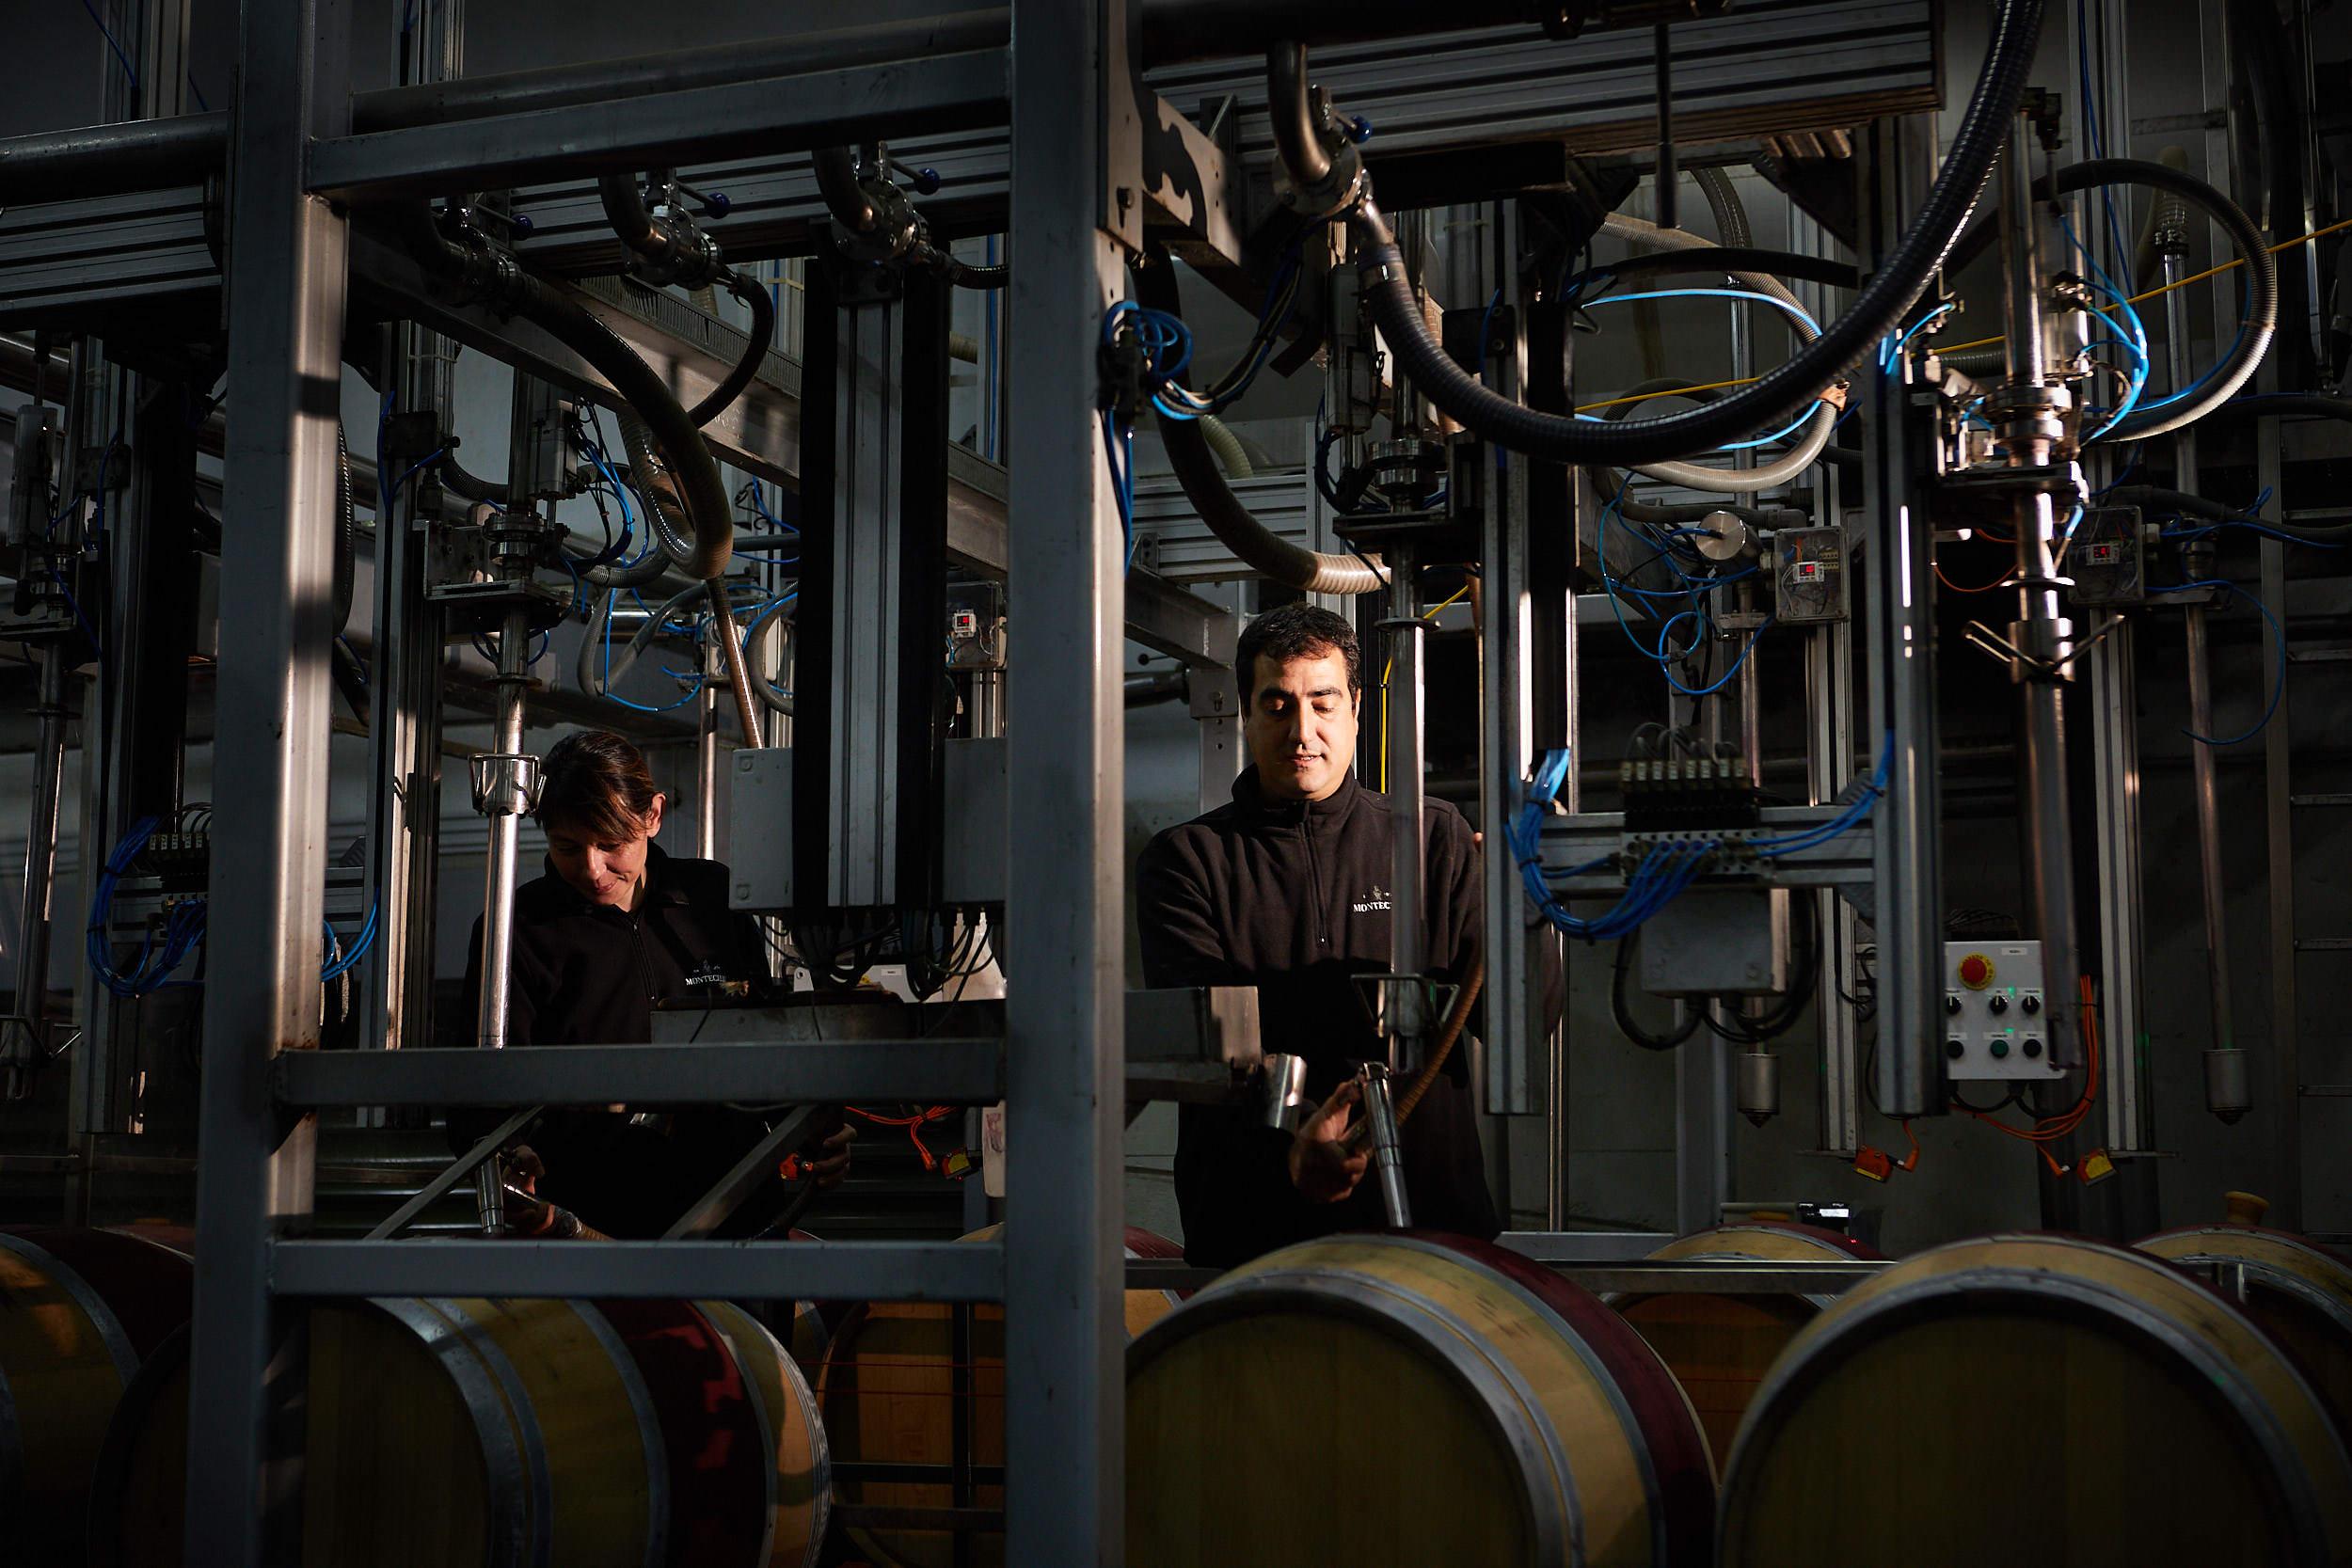 1805Commercial-professional-wine-photography-la-rioja-spain-James-Sturcke_0019.jpg